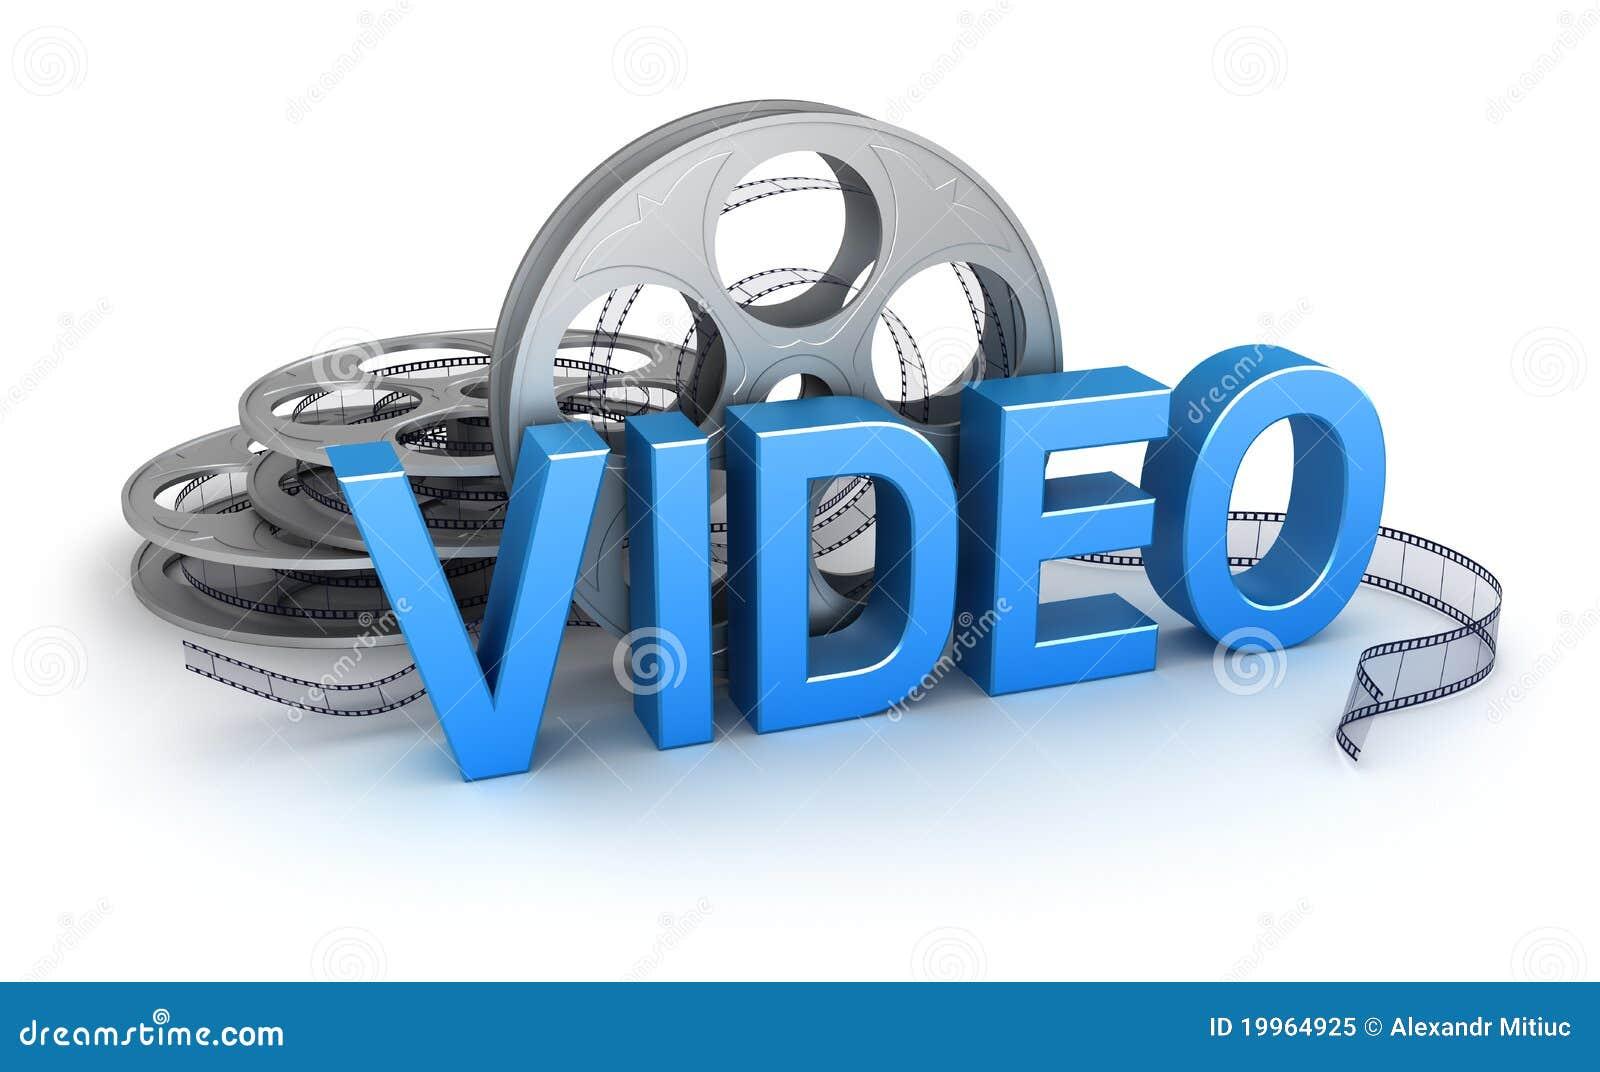 video concept icon royalty free stock photo image 19964925 film strip clip art images film strip clip art no border